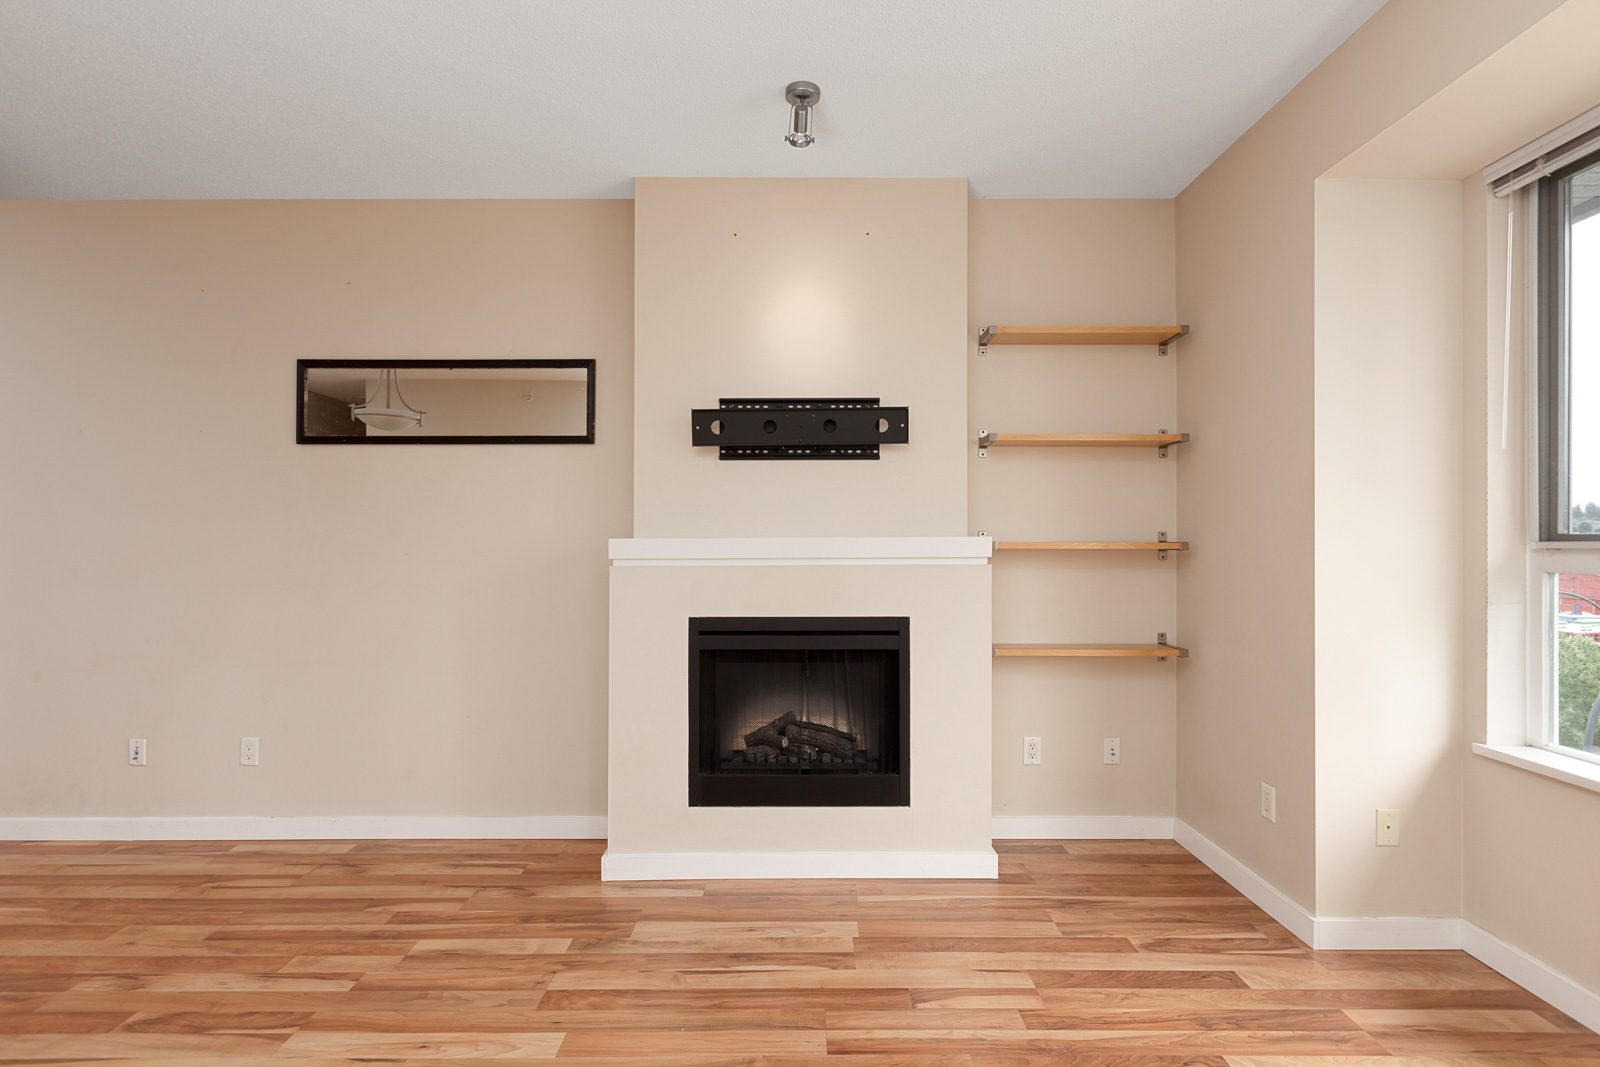 living room with hardwood floors in rental condo in the Brentwood neighbourhood of Burnaby